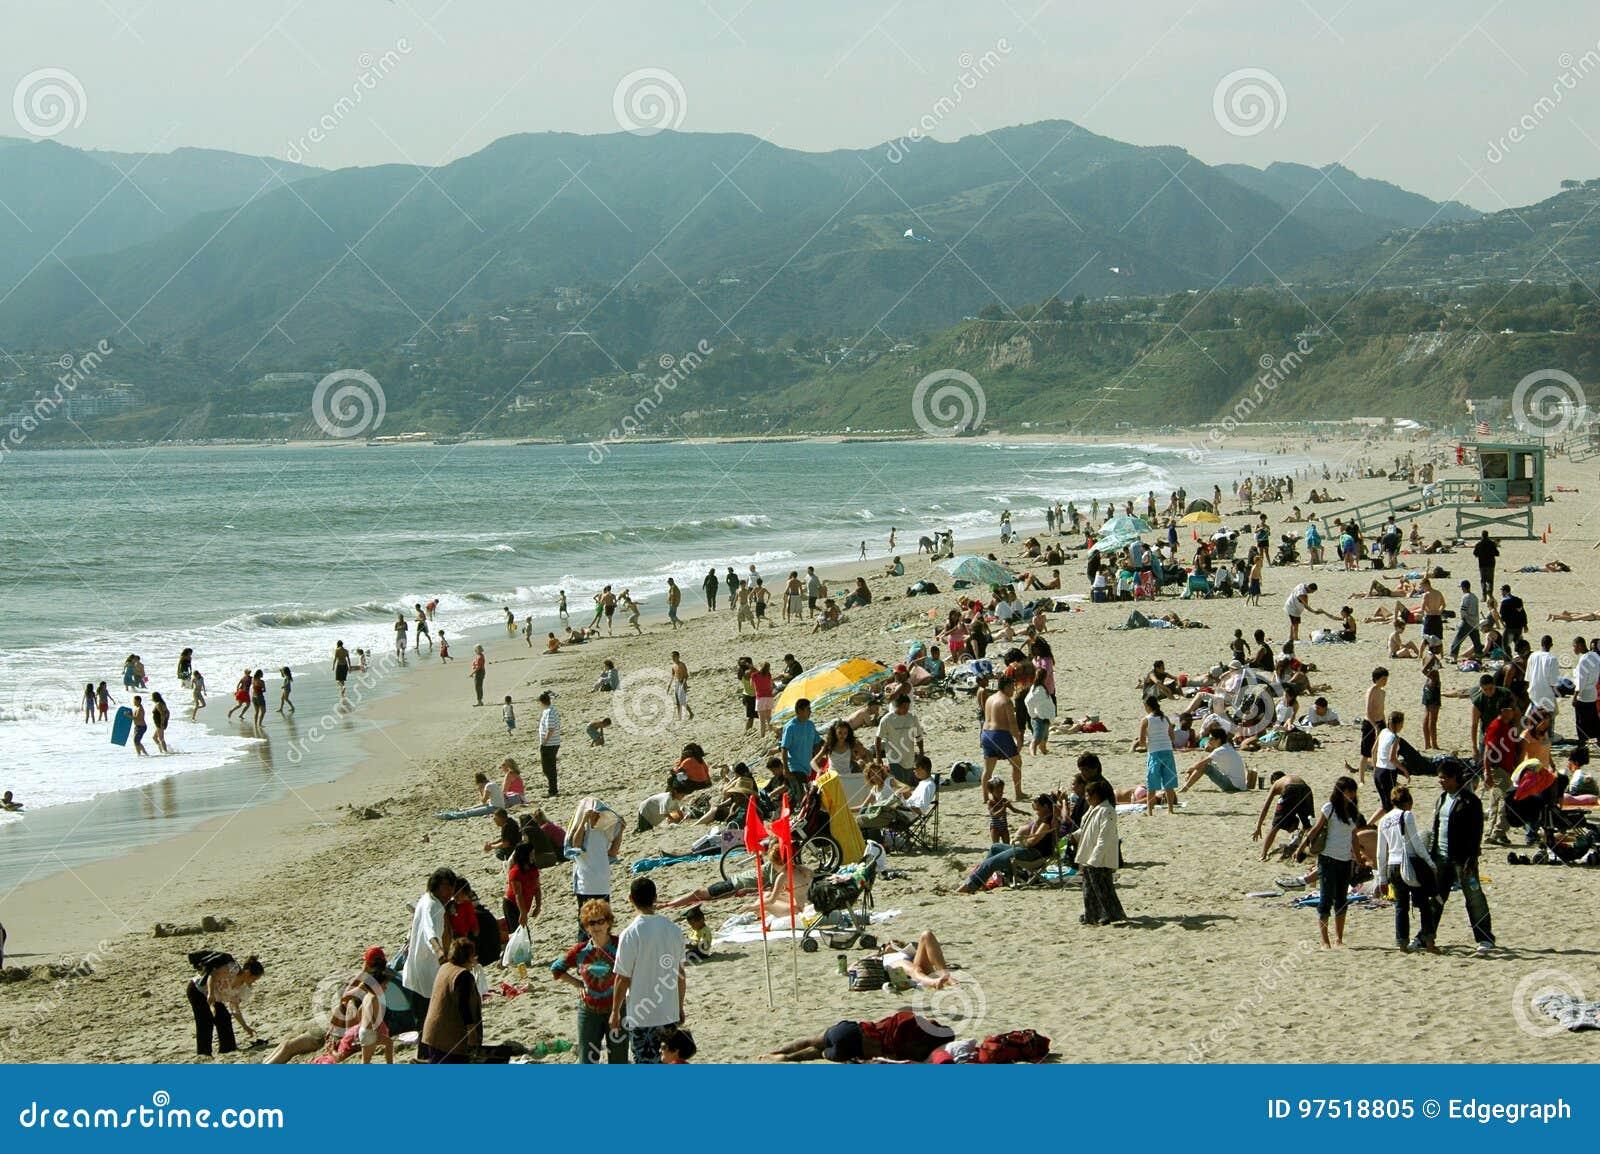 Comida campestre en la playa, Santa Monica Beach, California, los E.E.U.U.